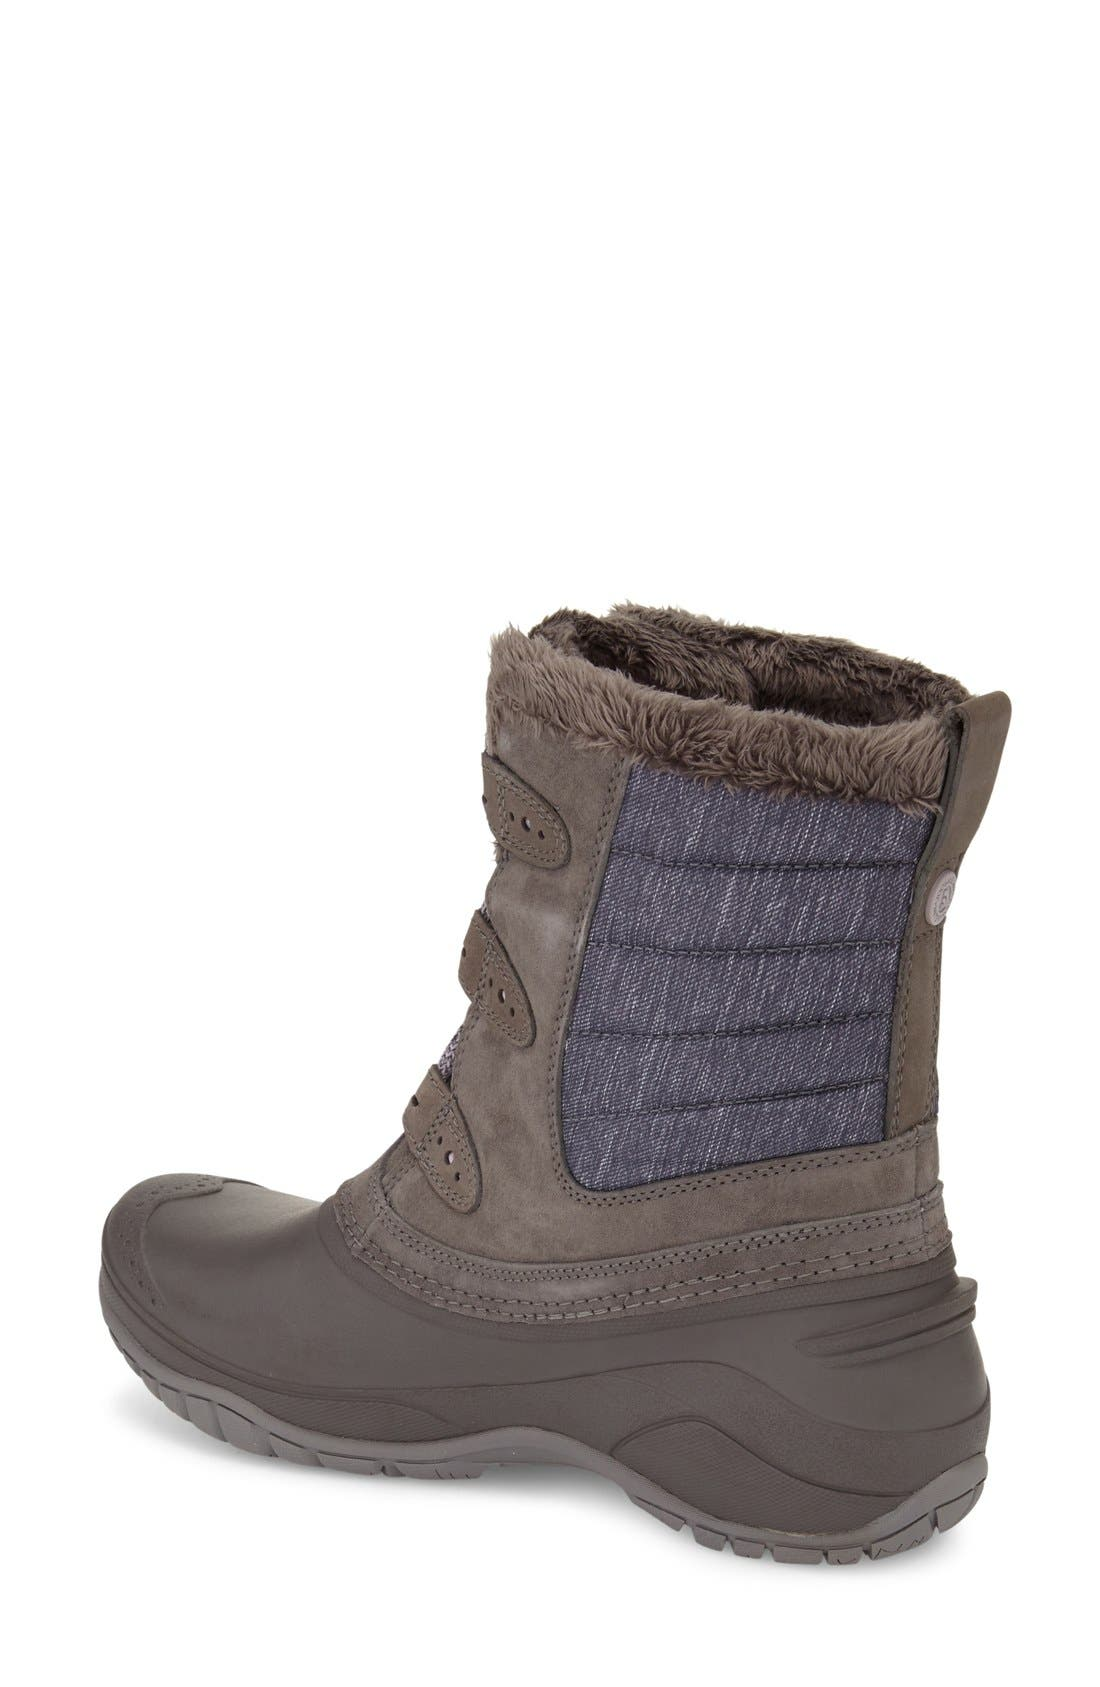 Alternate Image 2  - The North Face Shellista II Waterproof Boot (Women)